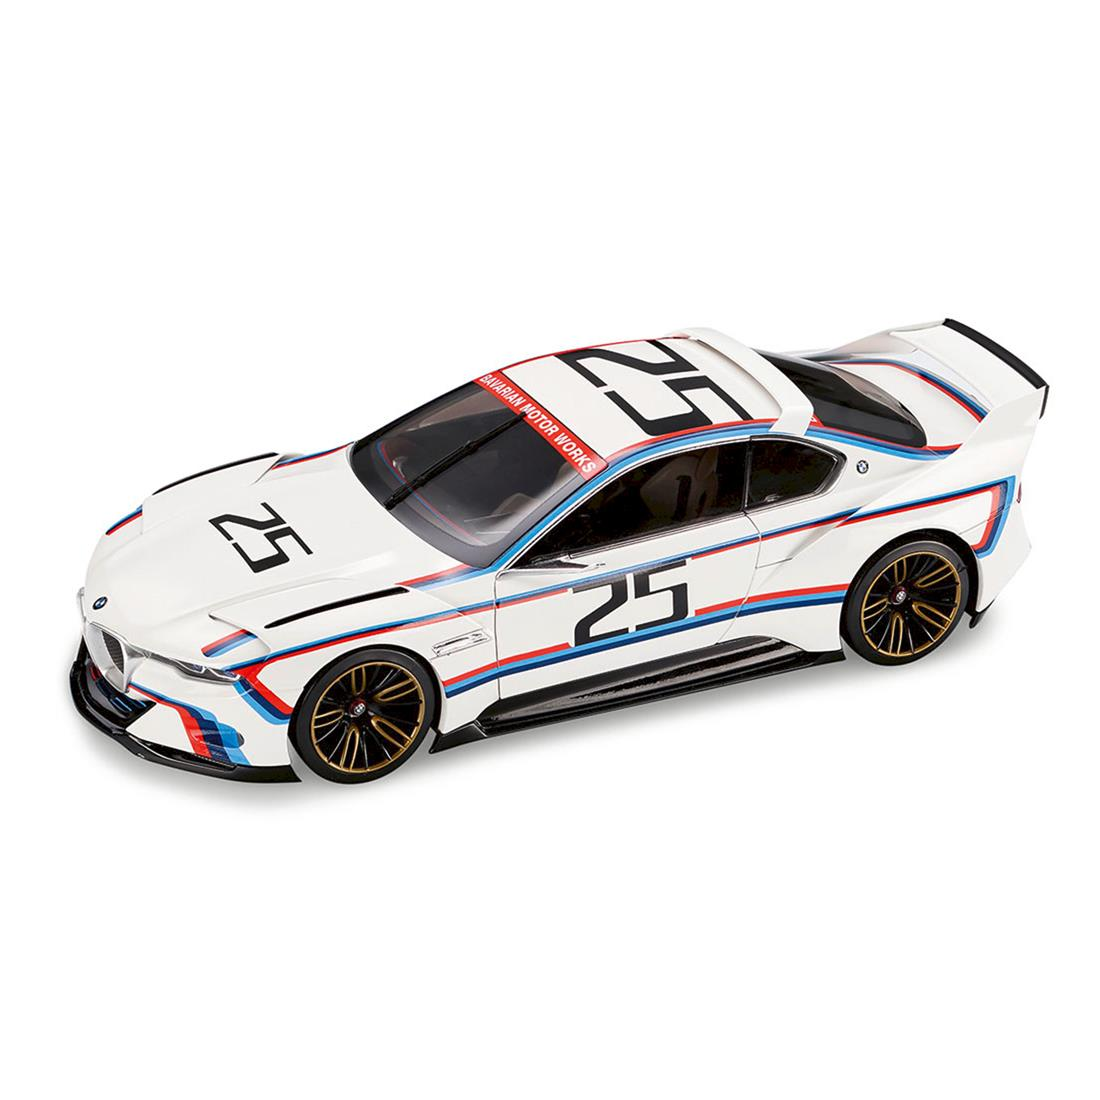 BMW Miniature 3.0 CSL R Homage 1:18